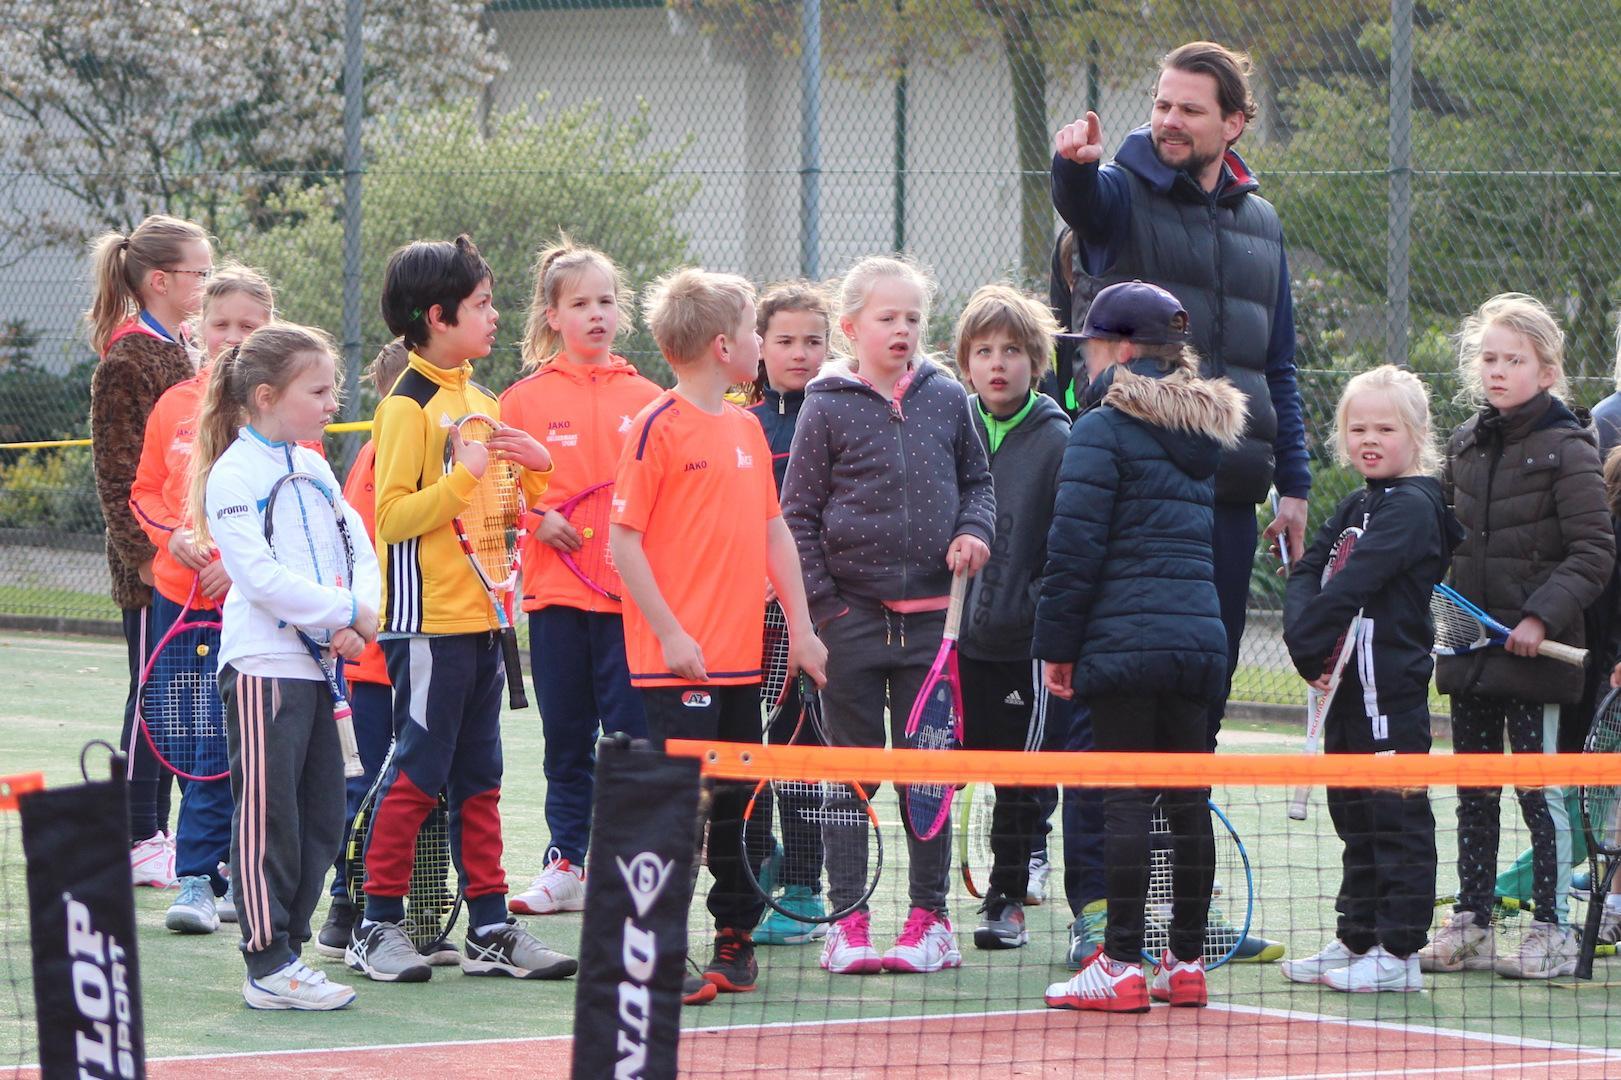 Tennis jeugd LTC Hofgeest Velsen City Blog